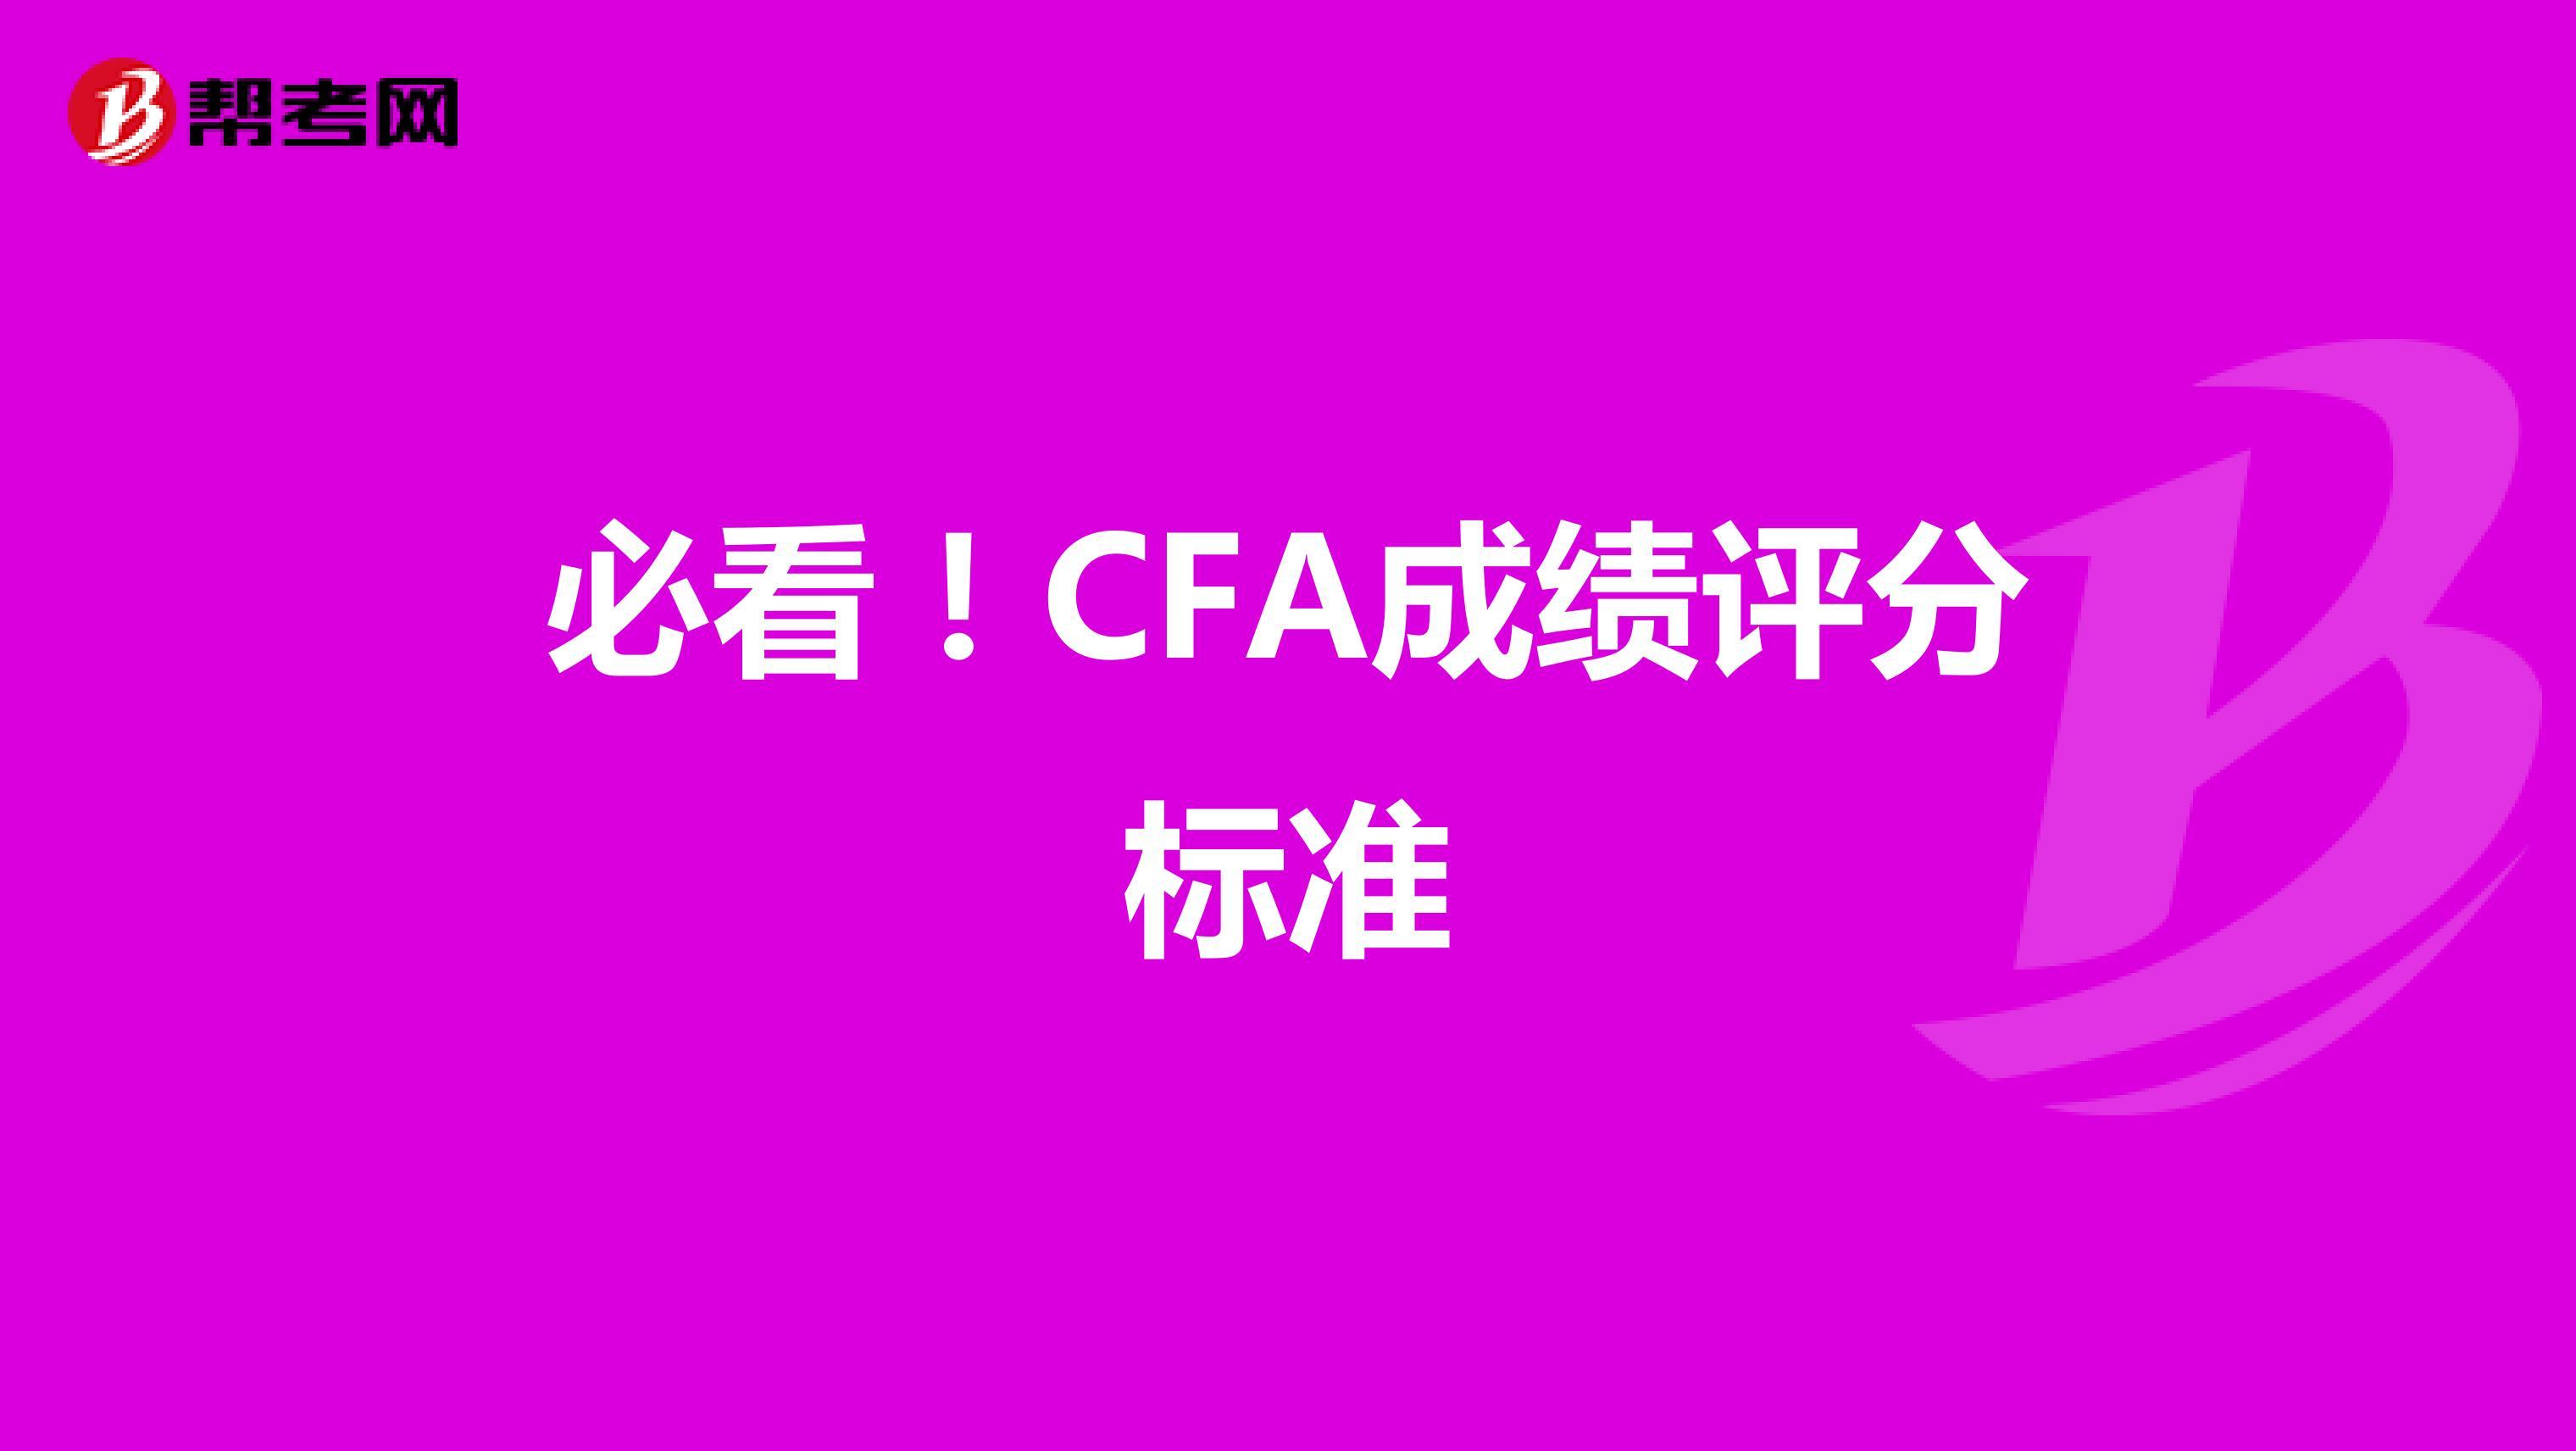 必看!CFA成绩评分标准